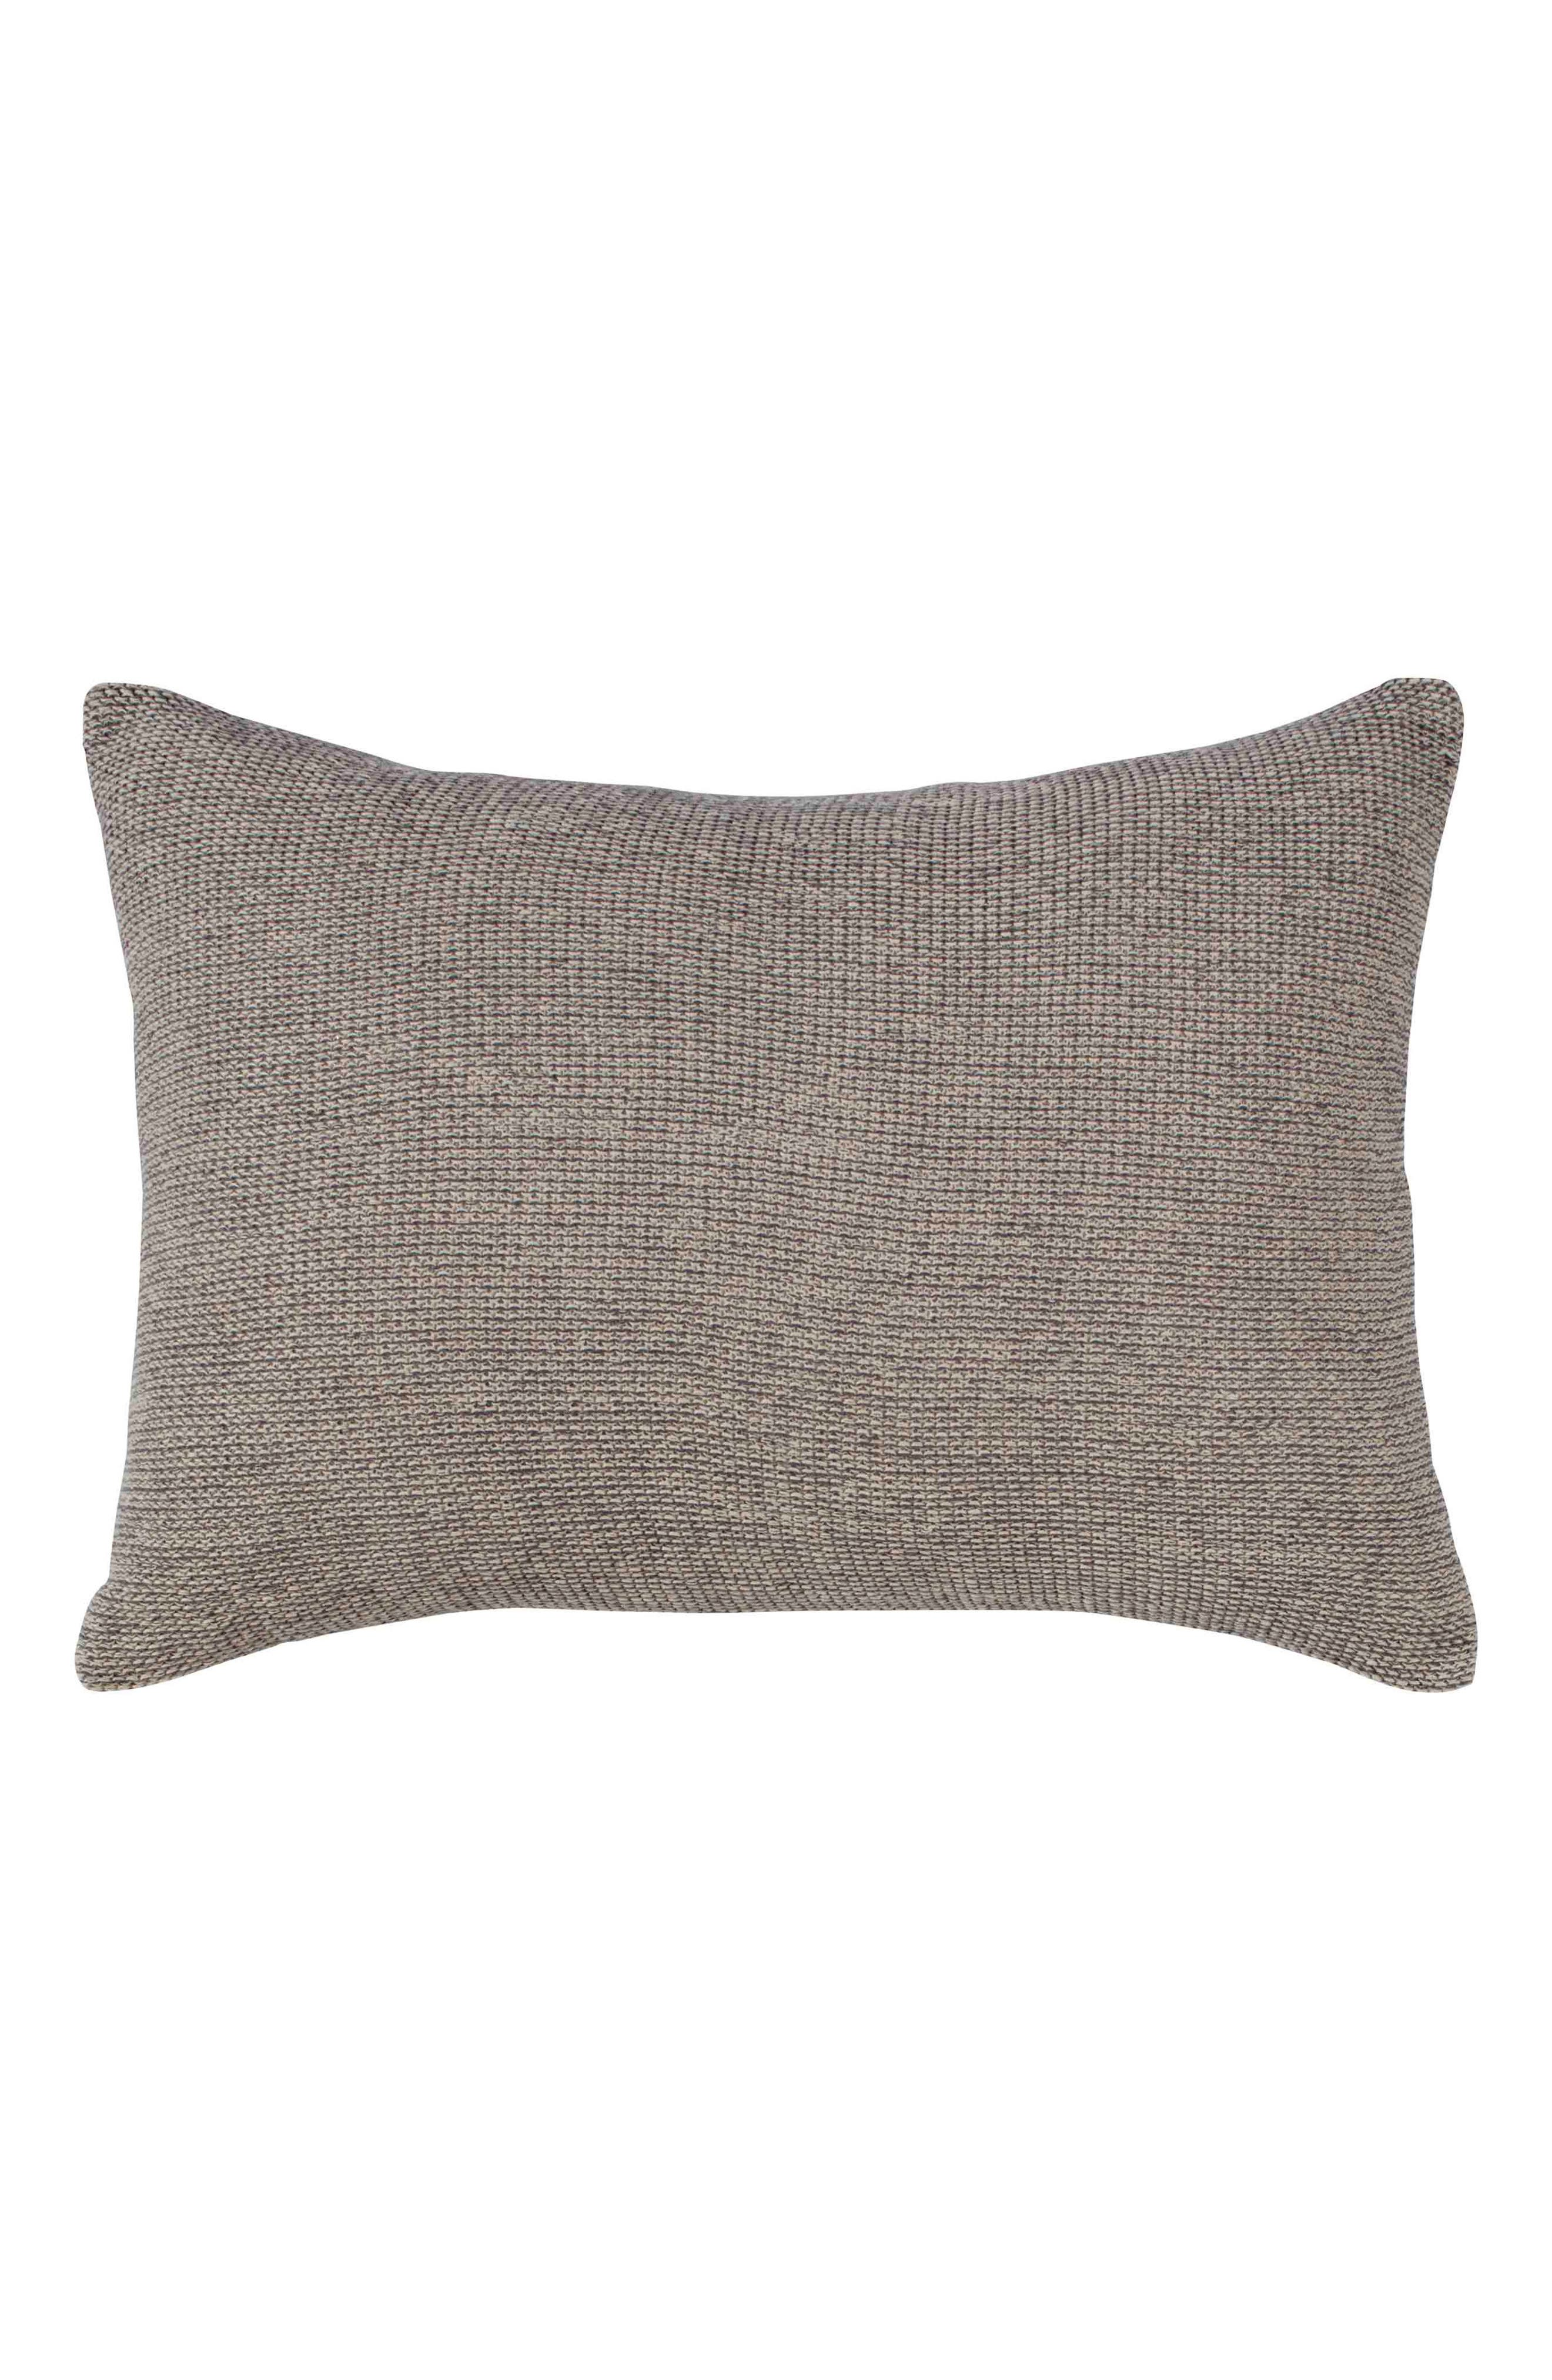 Tulare Bicolor Knit Accent Pillow,                             Main thumbnail 1, color,                             NATURAL